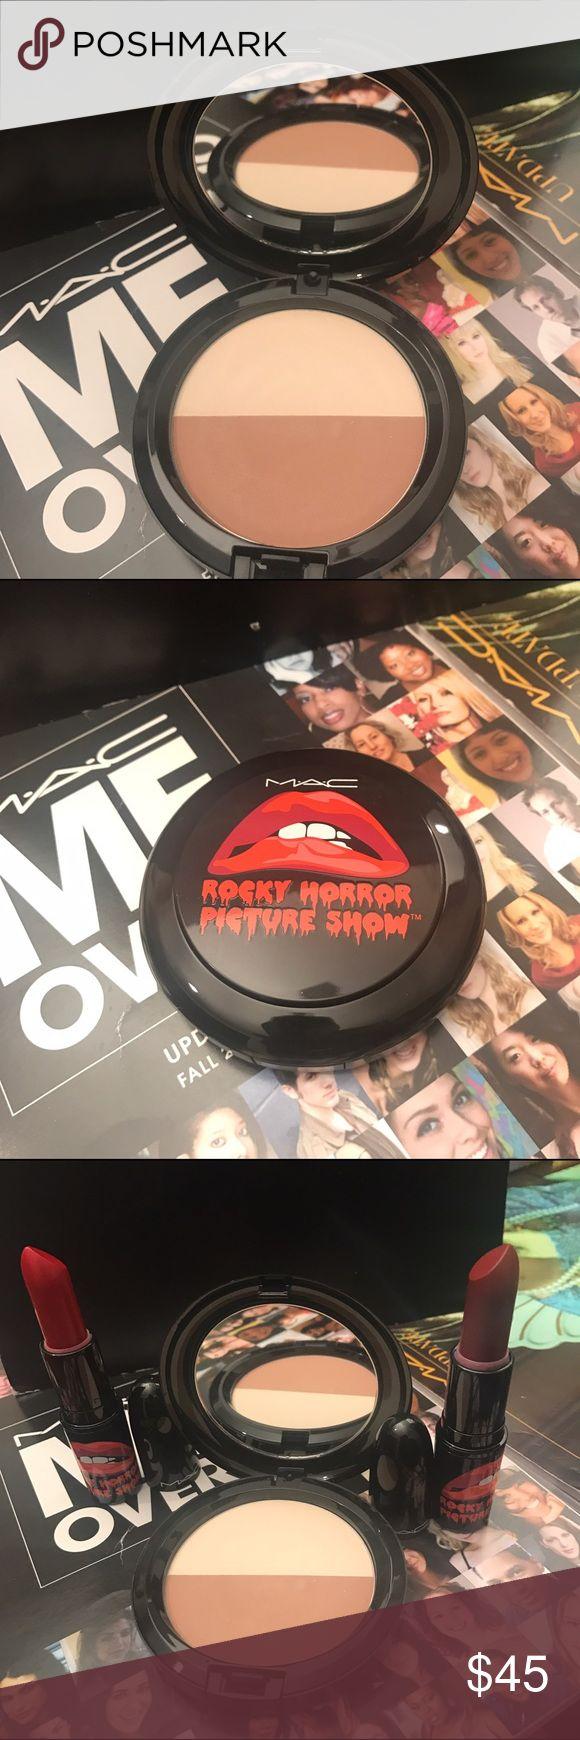 "M.A.C. ROCKY HORROR PICTURE SHOW SCULPT POWDER M.A.C. ROCKY HORROR PICTURE SHOW SCULPT AND SHAPE POWDER IN ""BONE BEIGE/ EMPHASIZE"" CONDITION: NEW (HIGHLIGHT & CONTOUR POWDER) MAC Cosmetics Makeup"